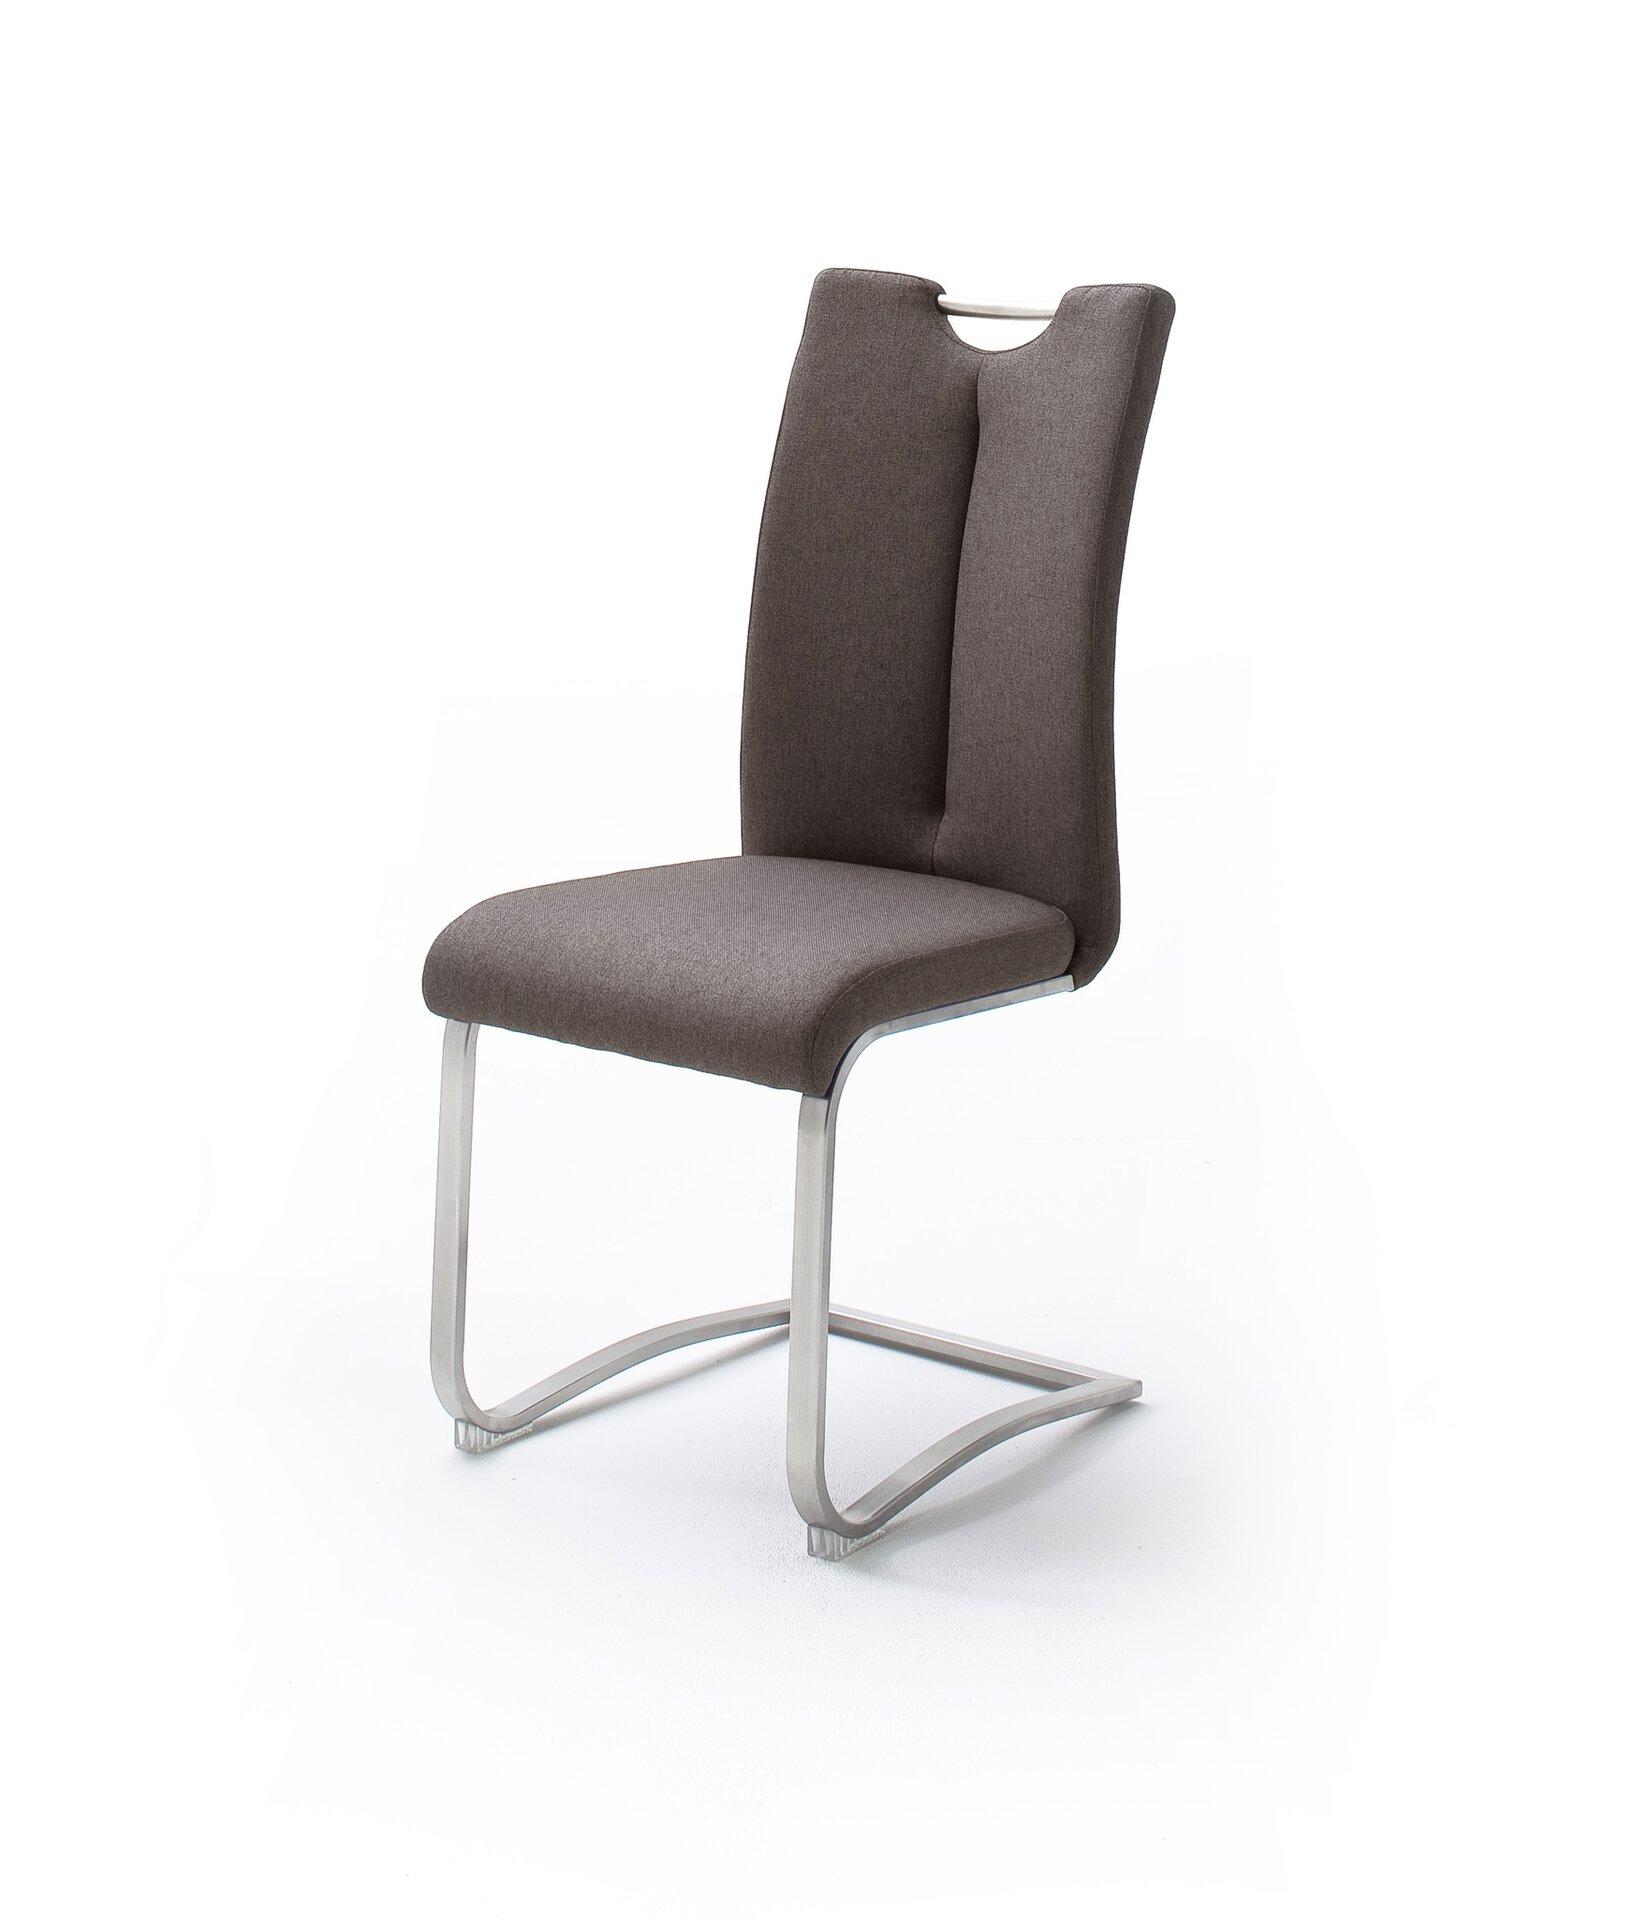 Stuhl ARTOS MCA furniture Textil braun 58 x 102 x 45 cm